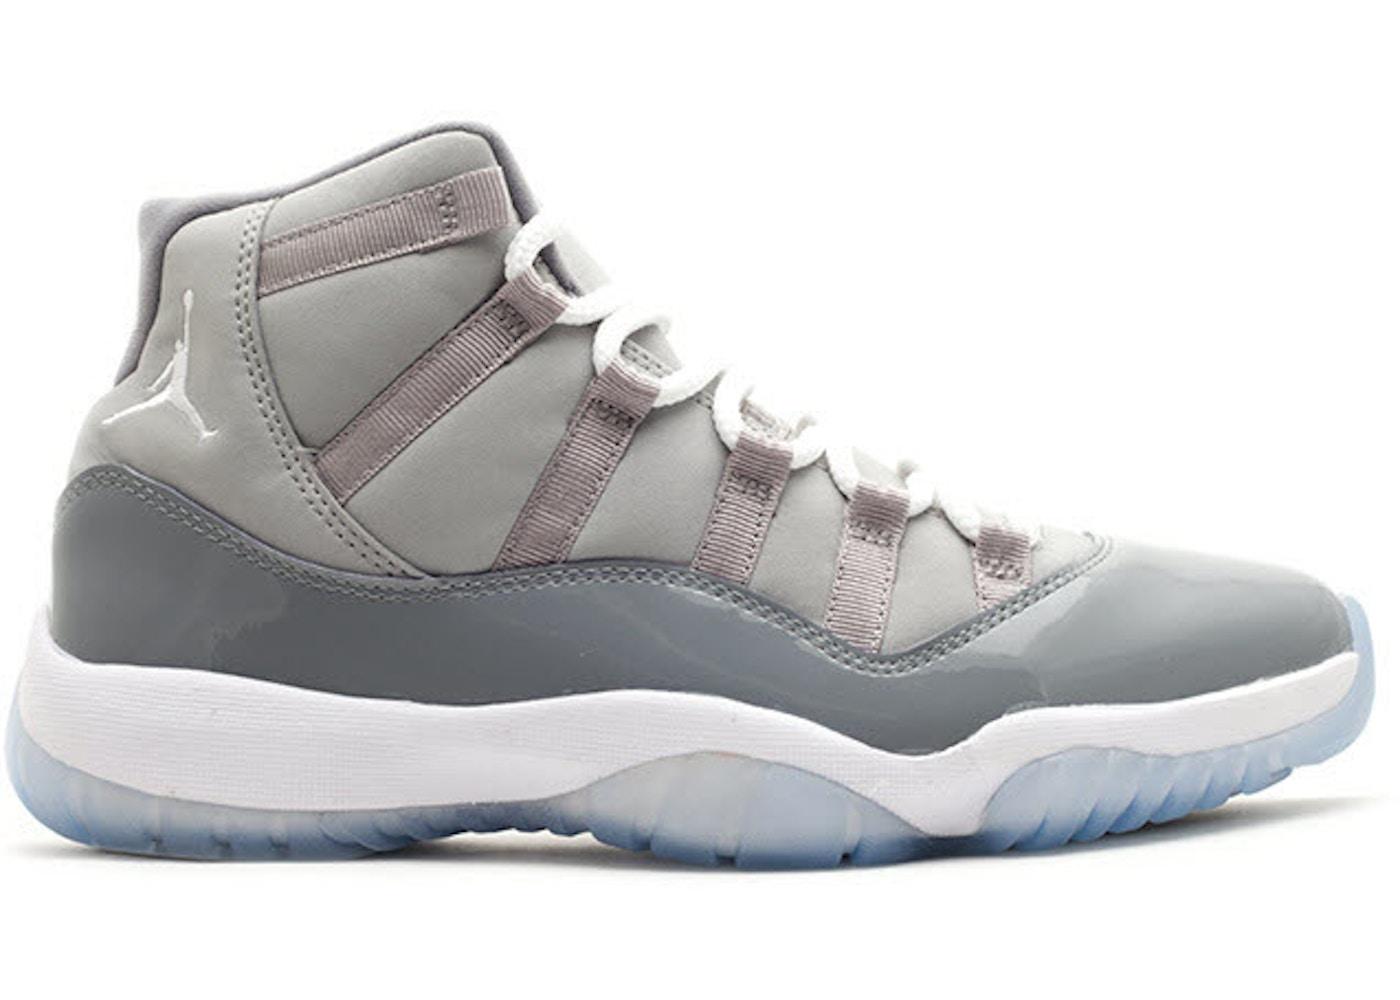 Air Jordan 11 Size 18 Shoes - Average Sale Price 7e5558064